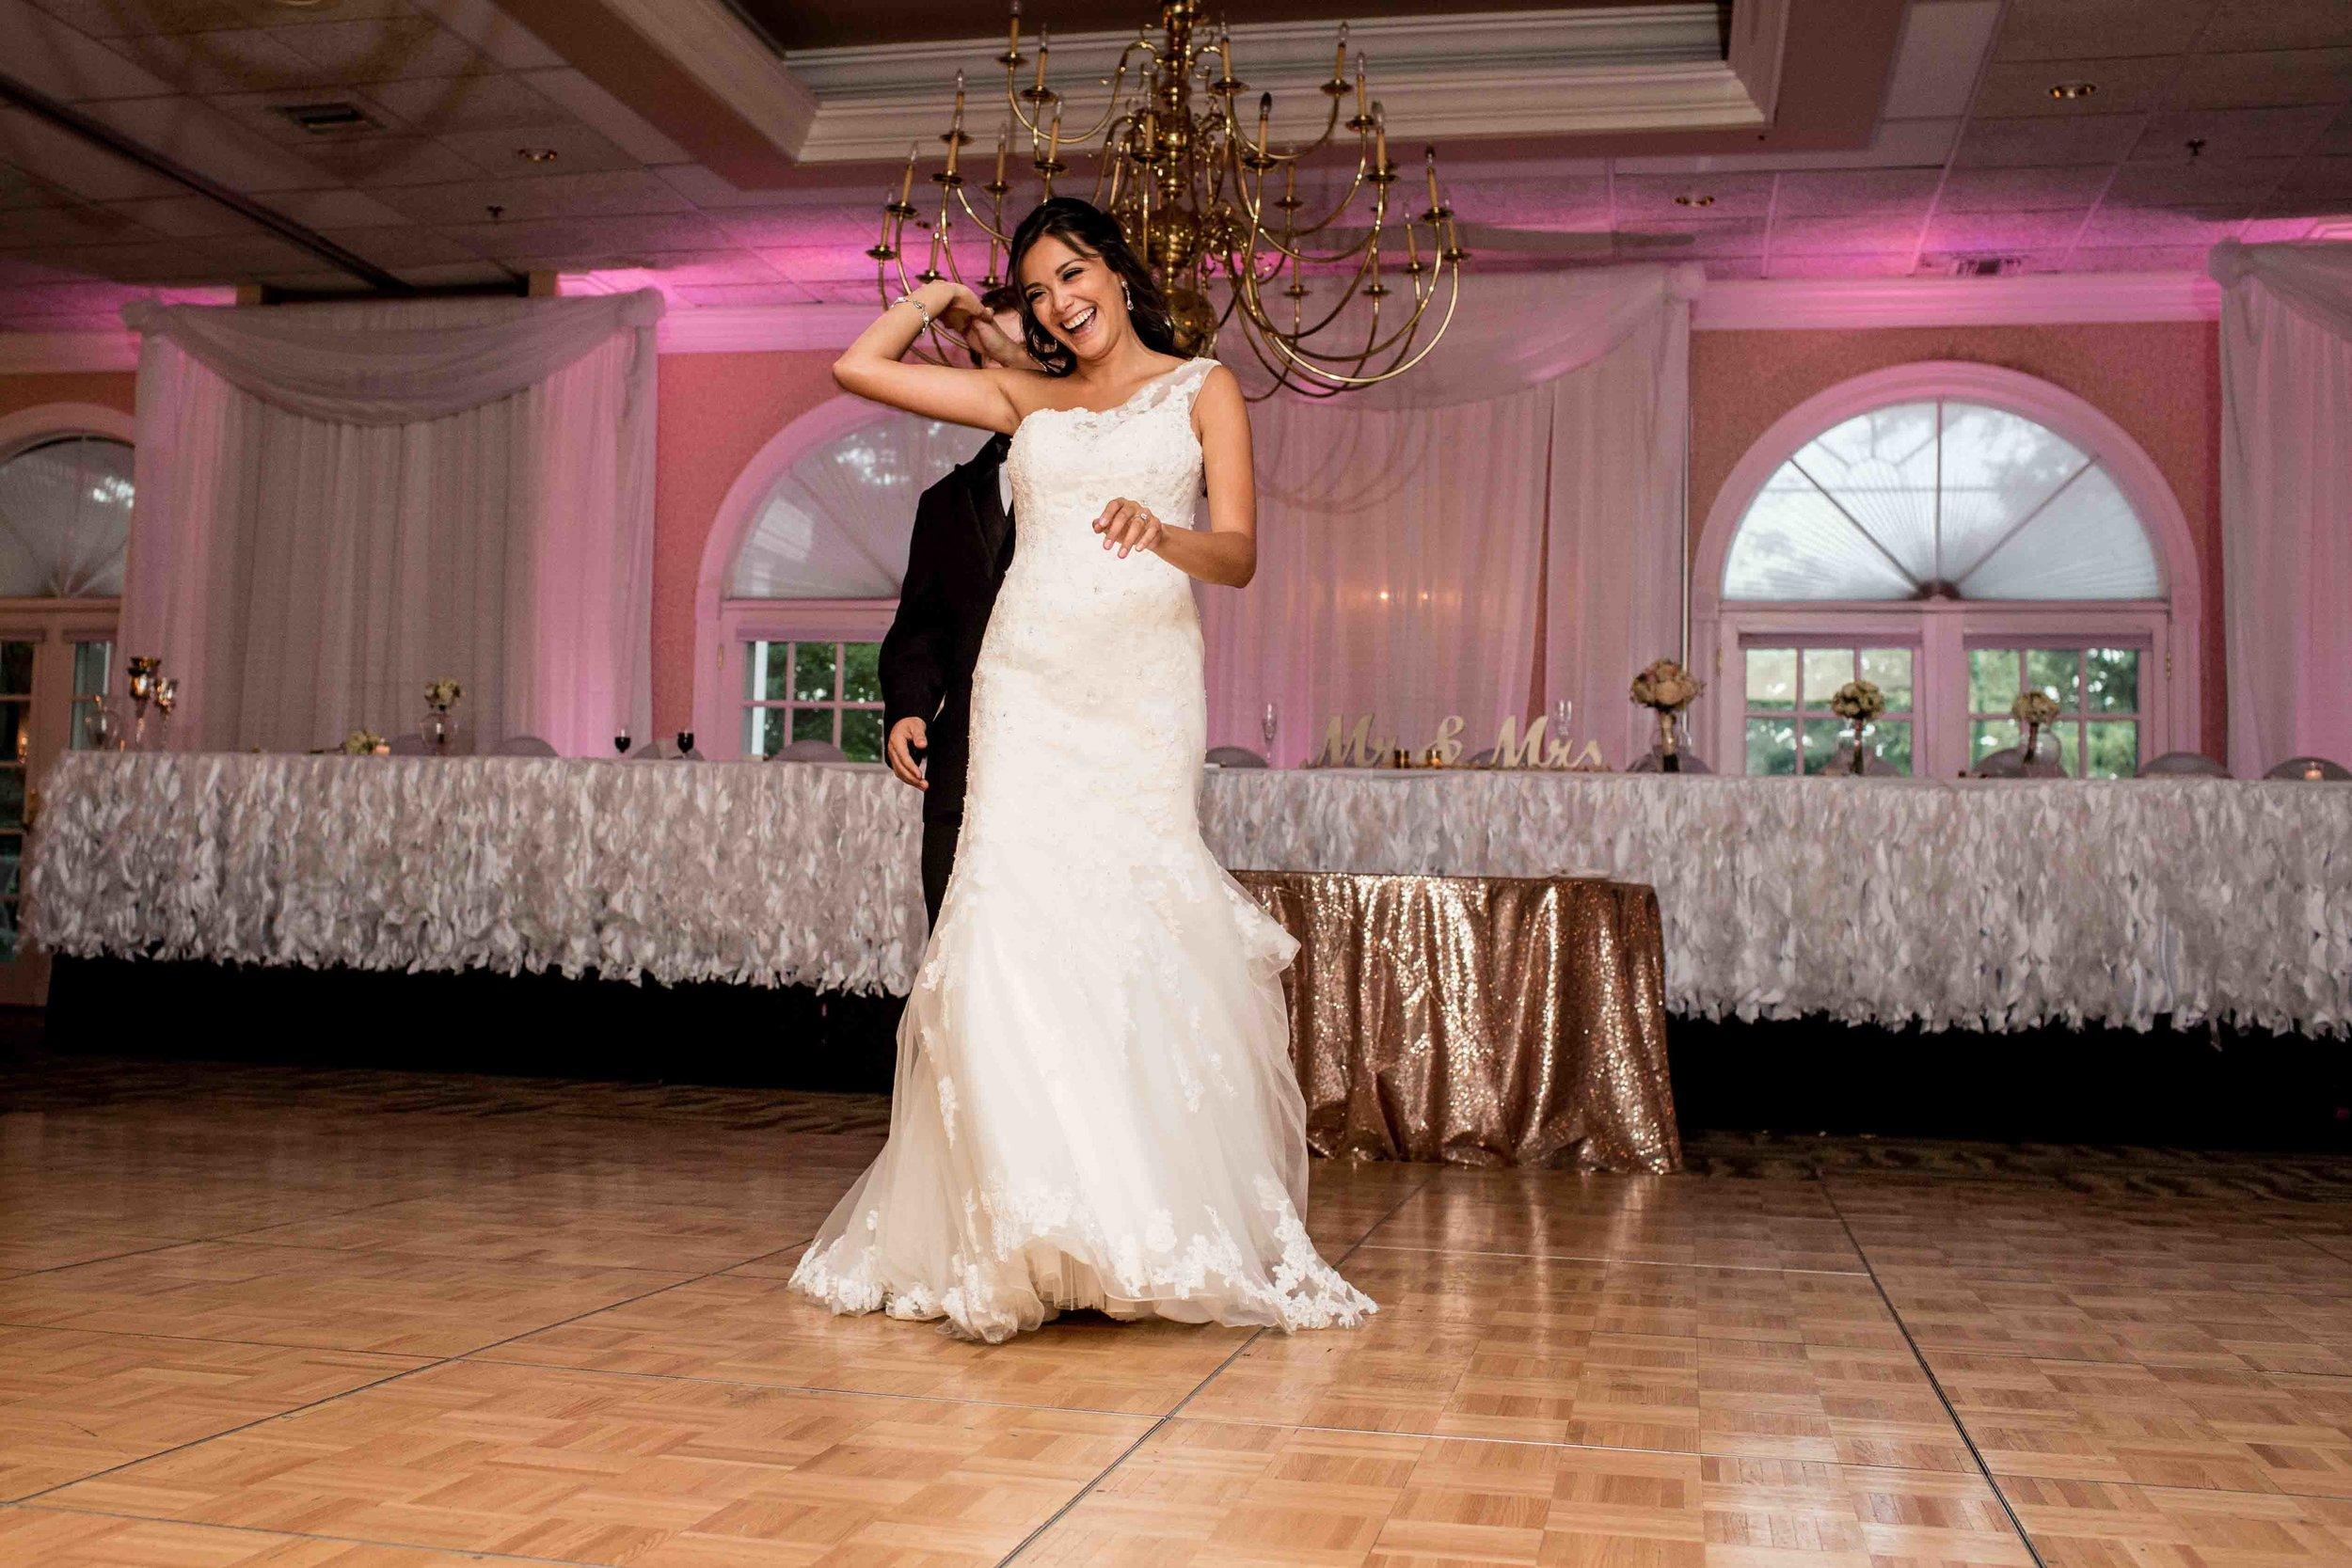 Destination Photographer wedding photos Best Wedding Photography Rose Photo -37.jpg